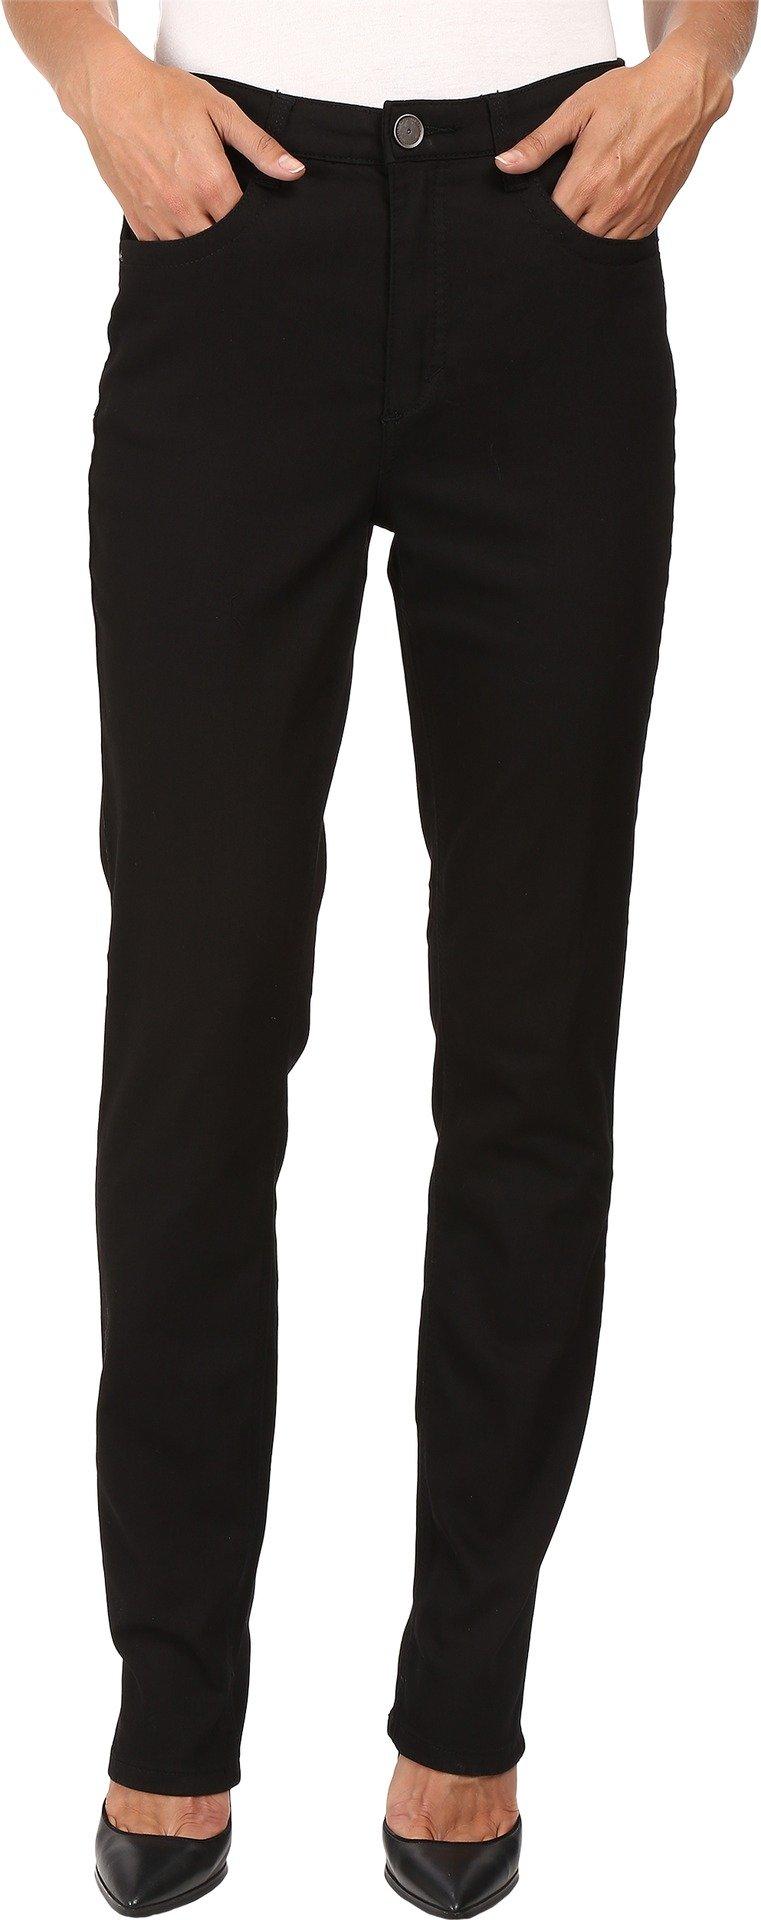 FDJ French Dressing Jeans Women's Supreme Denim Suzanne Slim Leg in Black Black 8 33